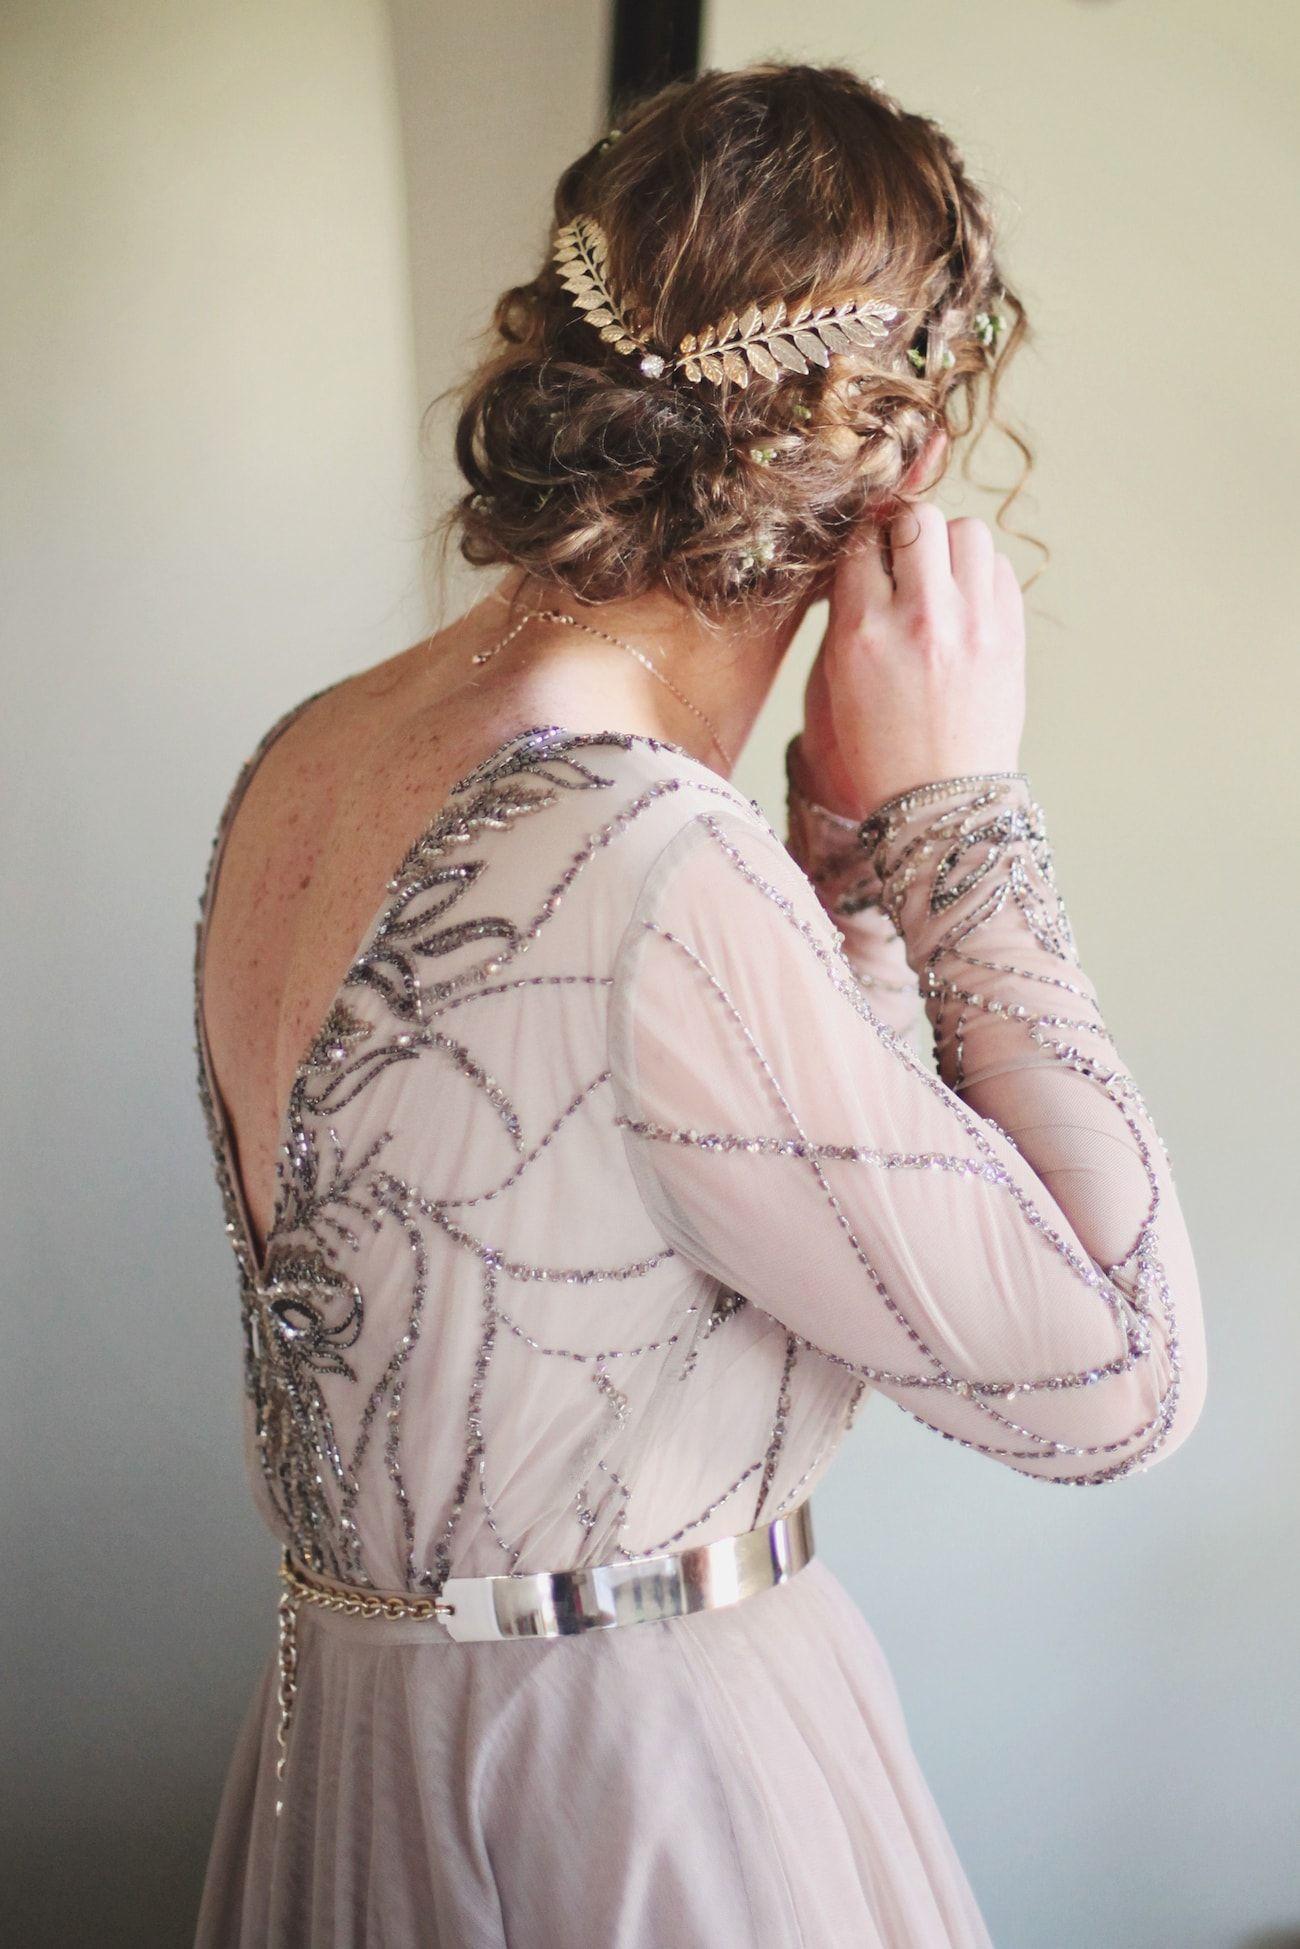 Boho wedding dress with romantic updo credit carmen roberts